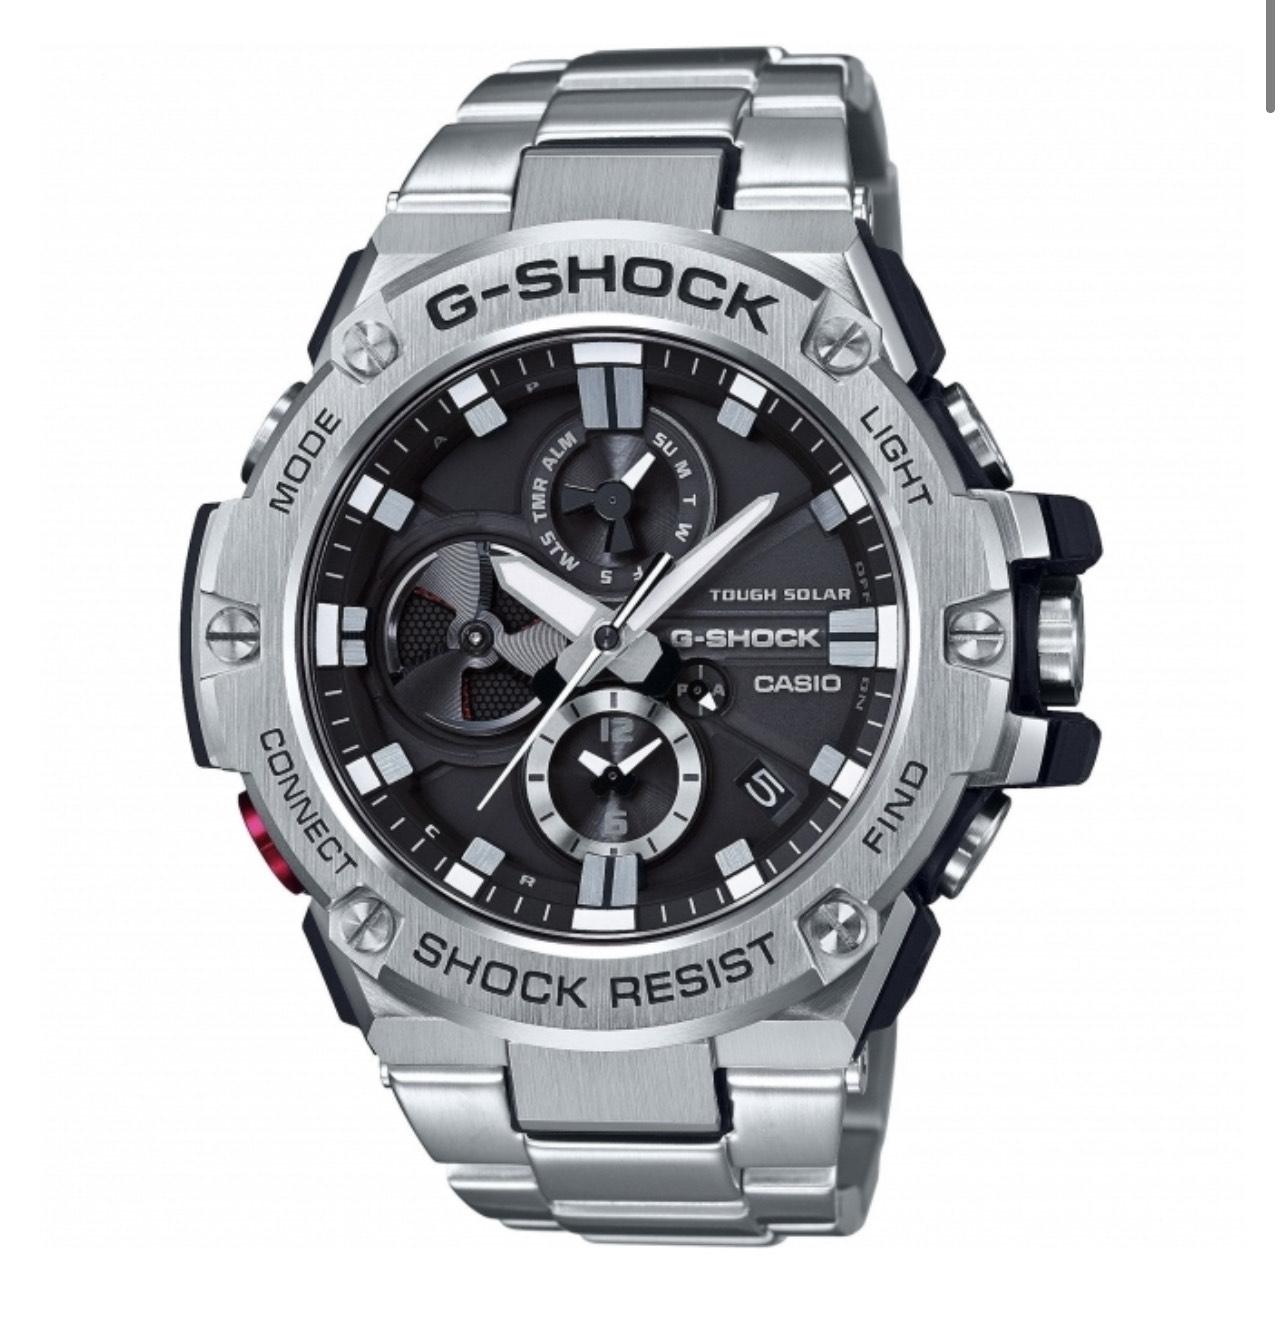 Casio G-Shock G-Steel Bluetooth Triple Connect Chrono Solar Watch GST-B100D-1AER £239 at Simpkins Jewellers